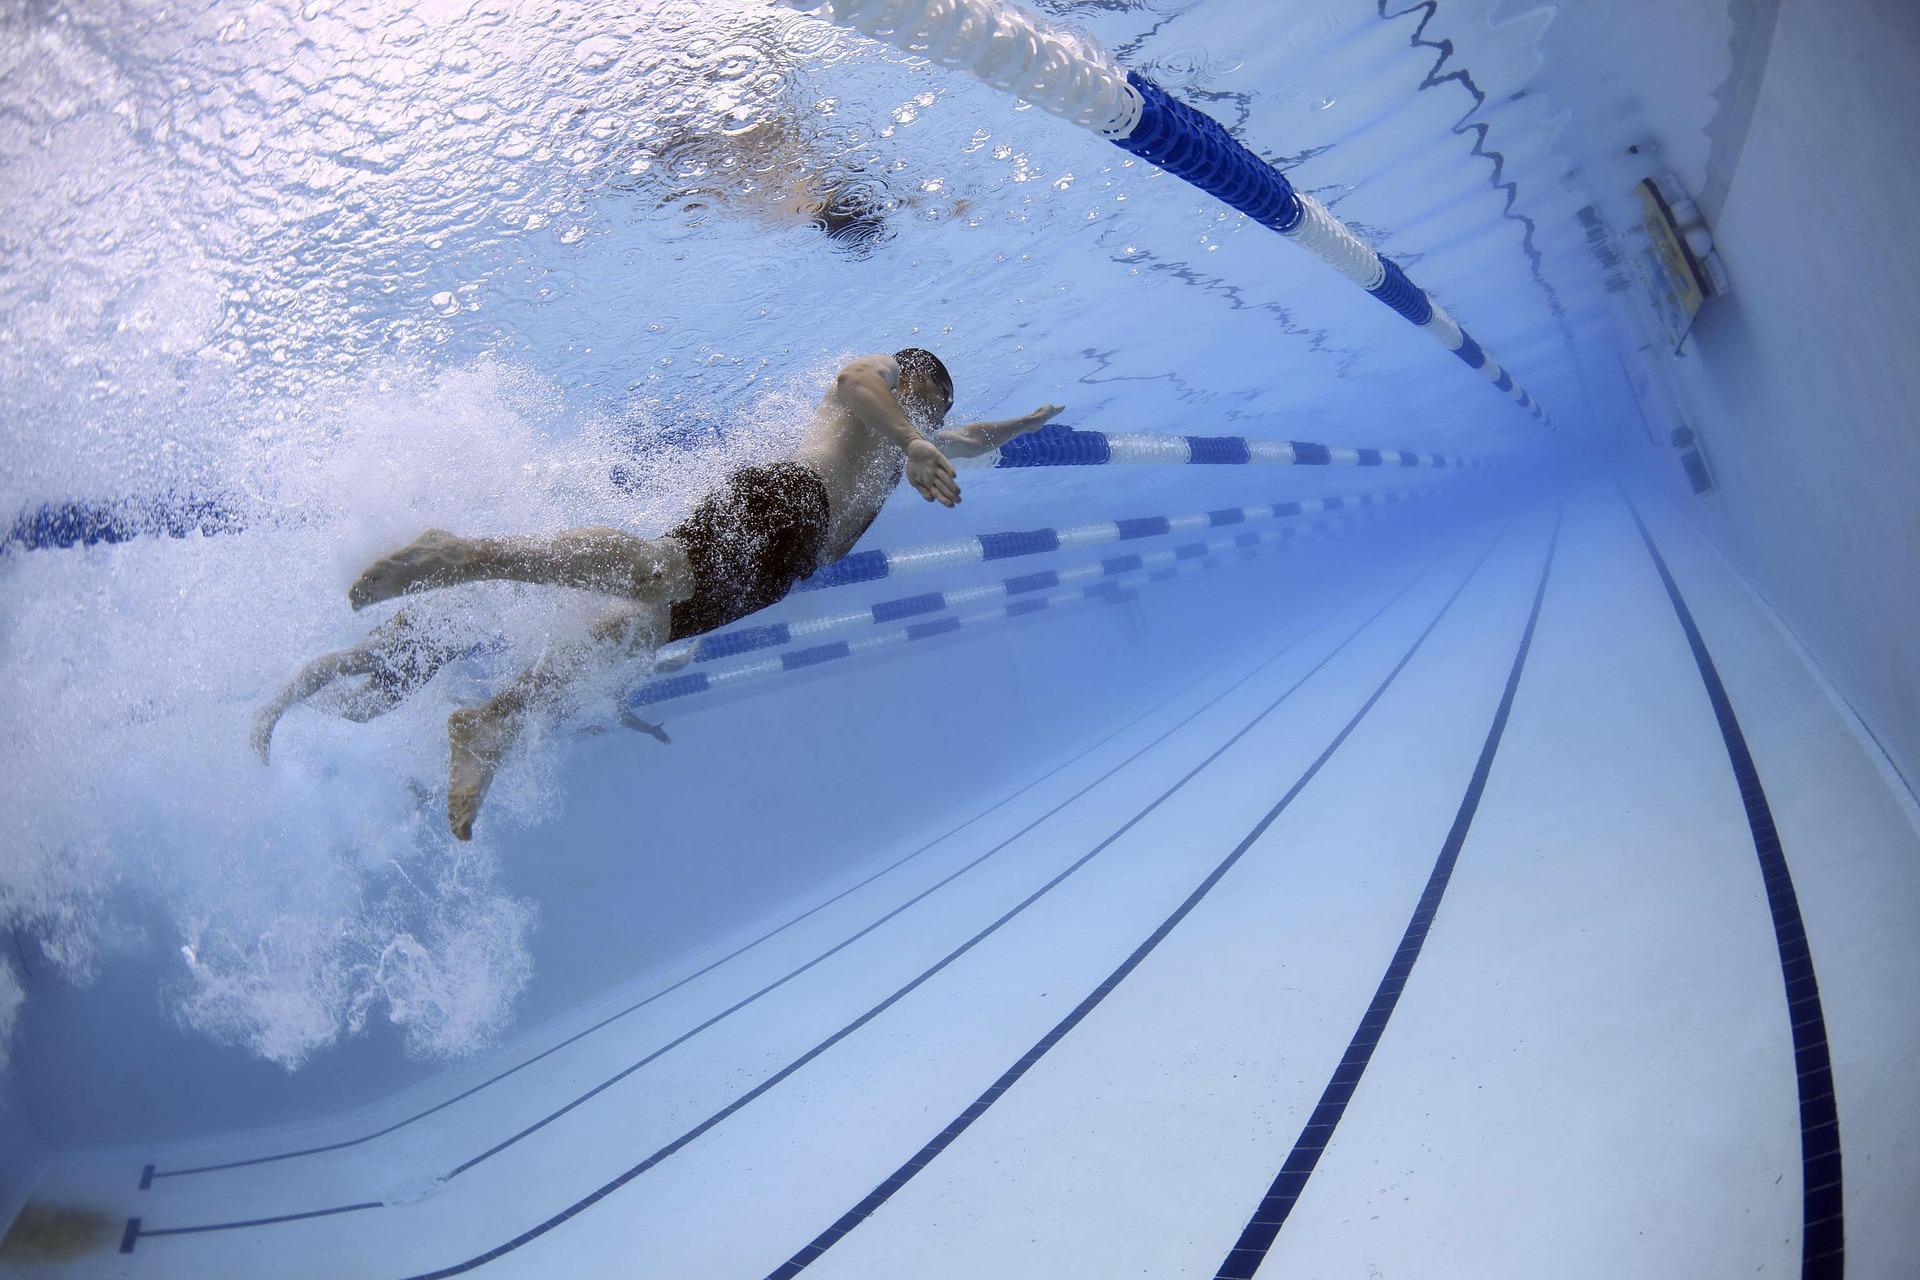 Swimming pool courses Paul R Salmon